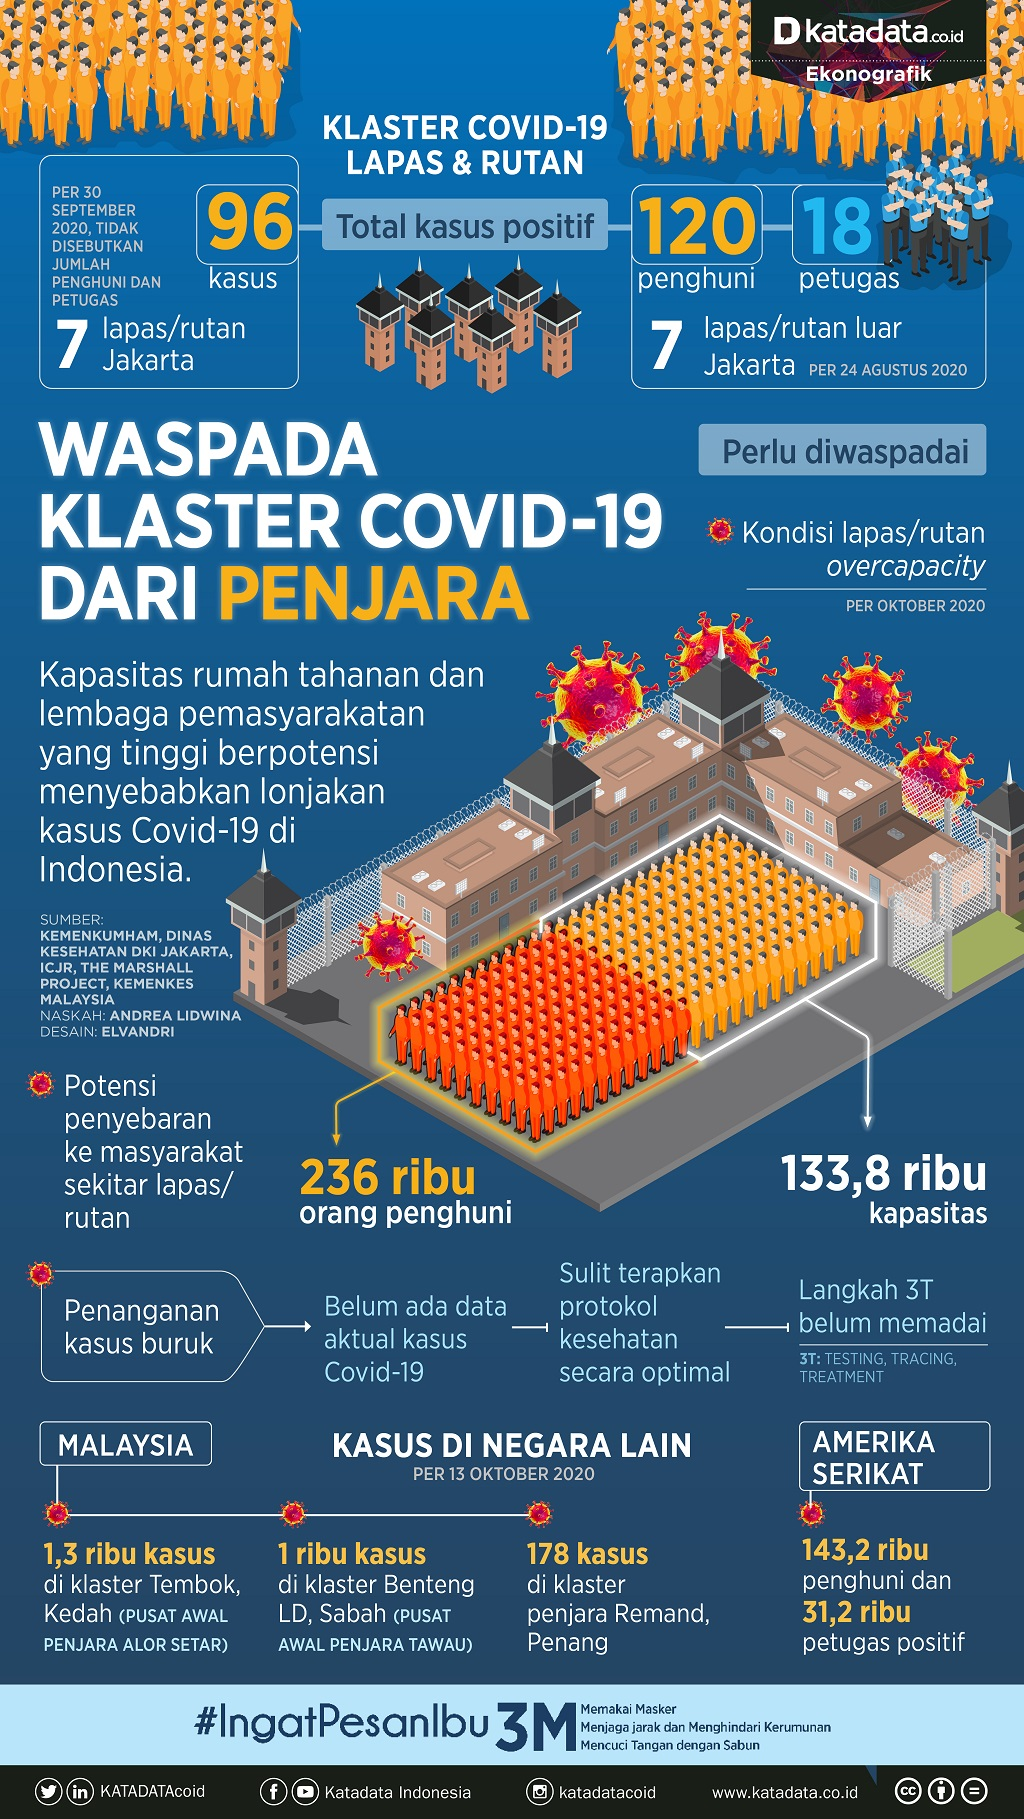 Infografik_Waspada klaster covid di penjara